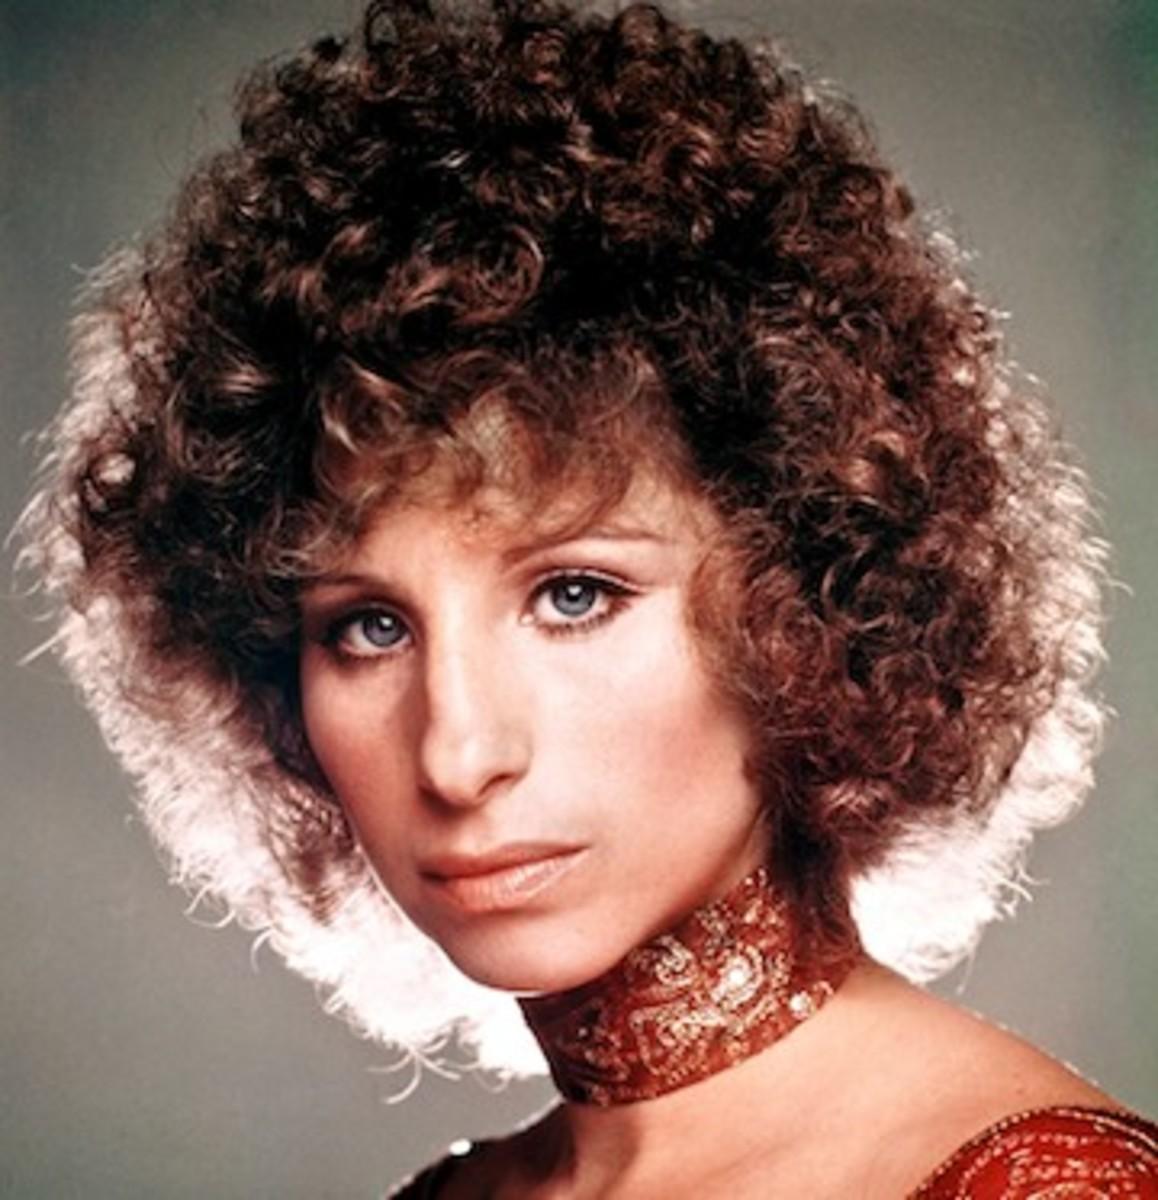 More 1970's-Barbara Streisand